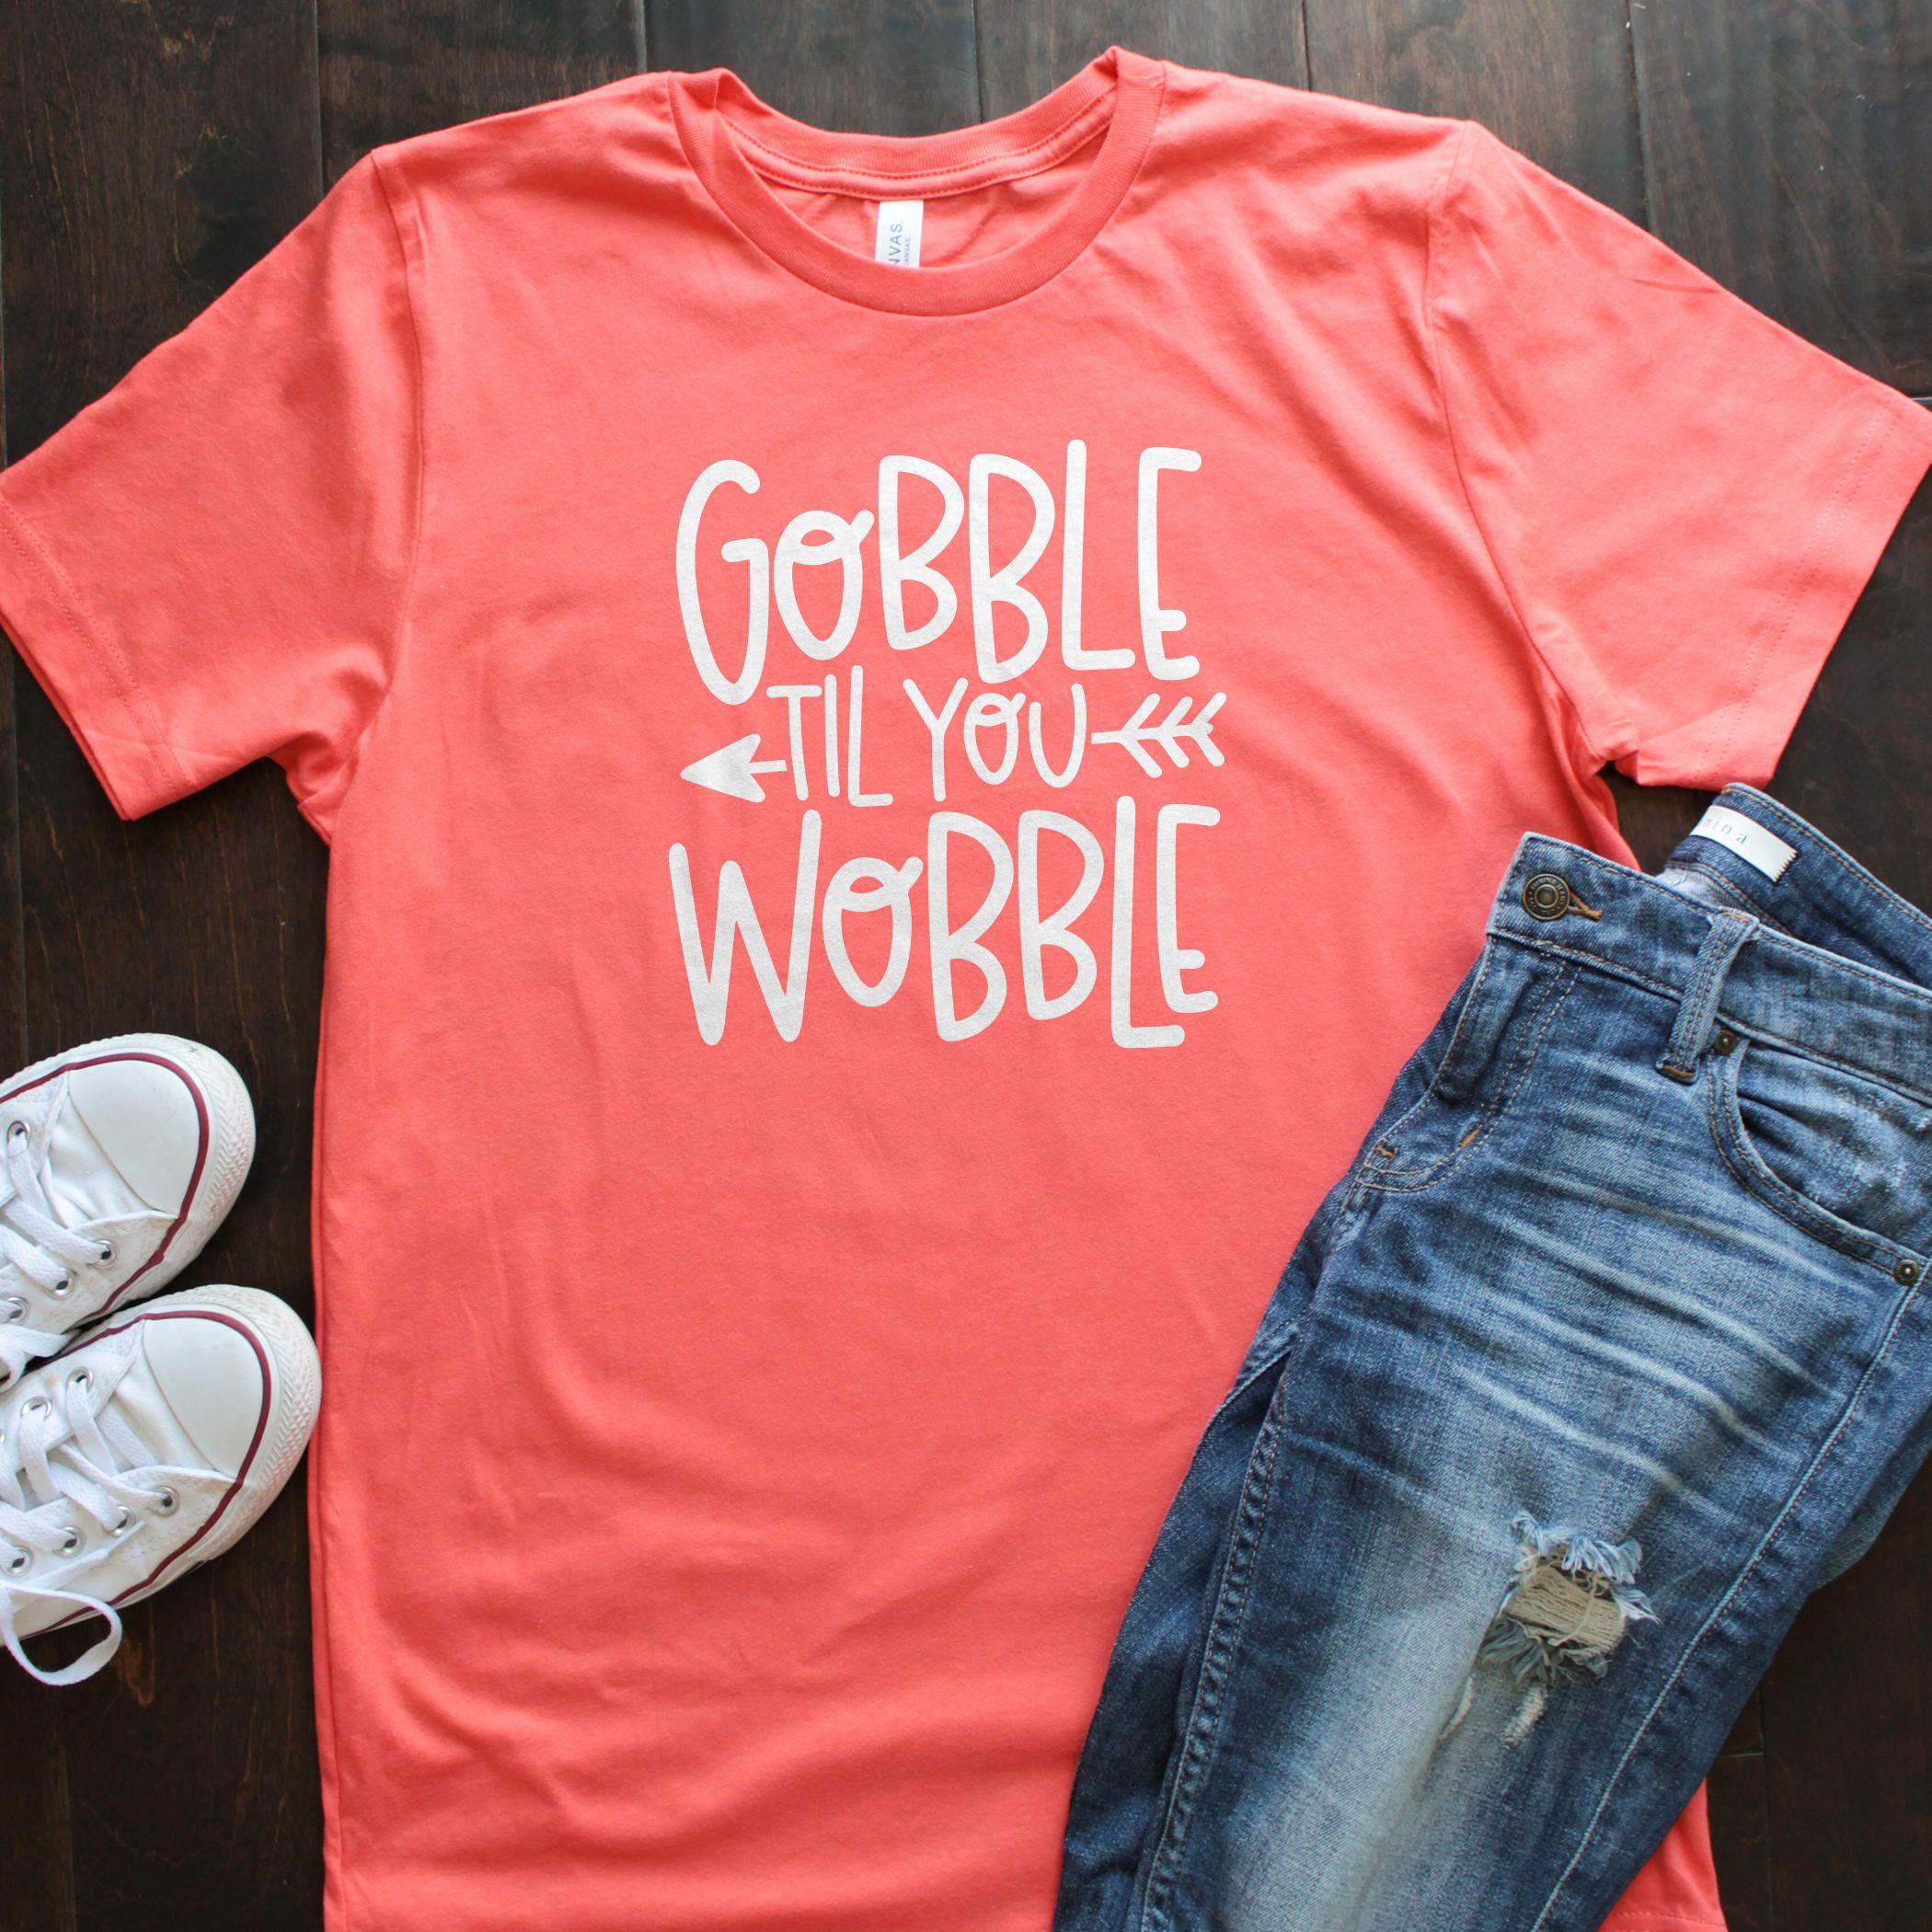 d69dc91af Thanksgiving Shirt, Thanksgiving T Shirt, Funny Thanksgiving Shirts,  Thanksgiving outfit, Gobble til you wobble, turkey shirt, thanksgiving